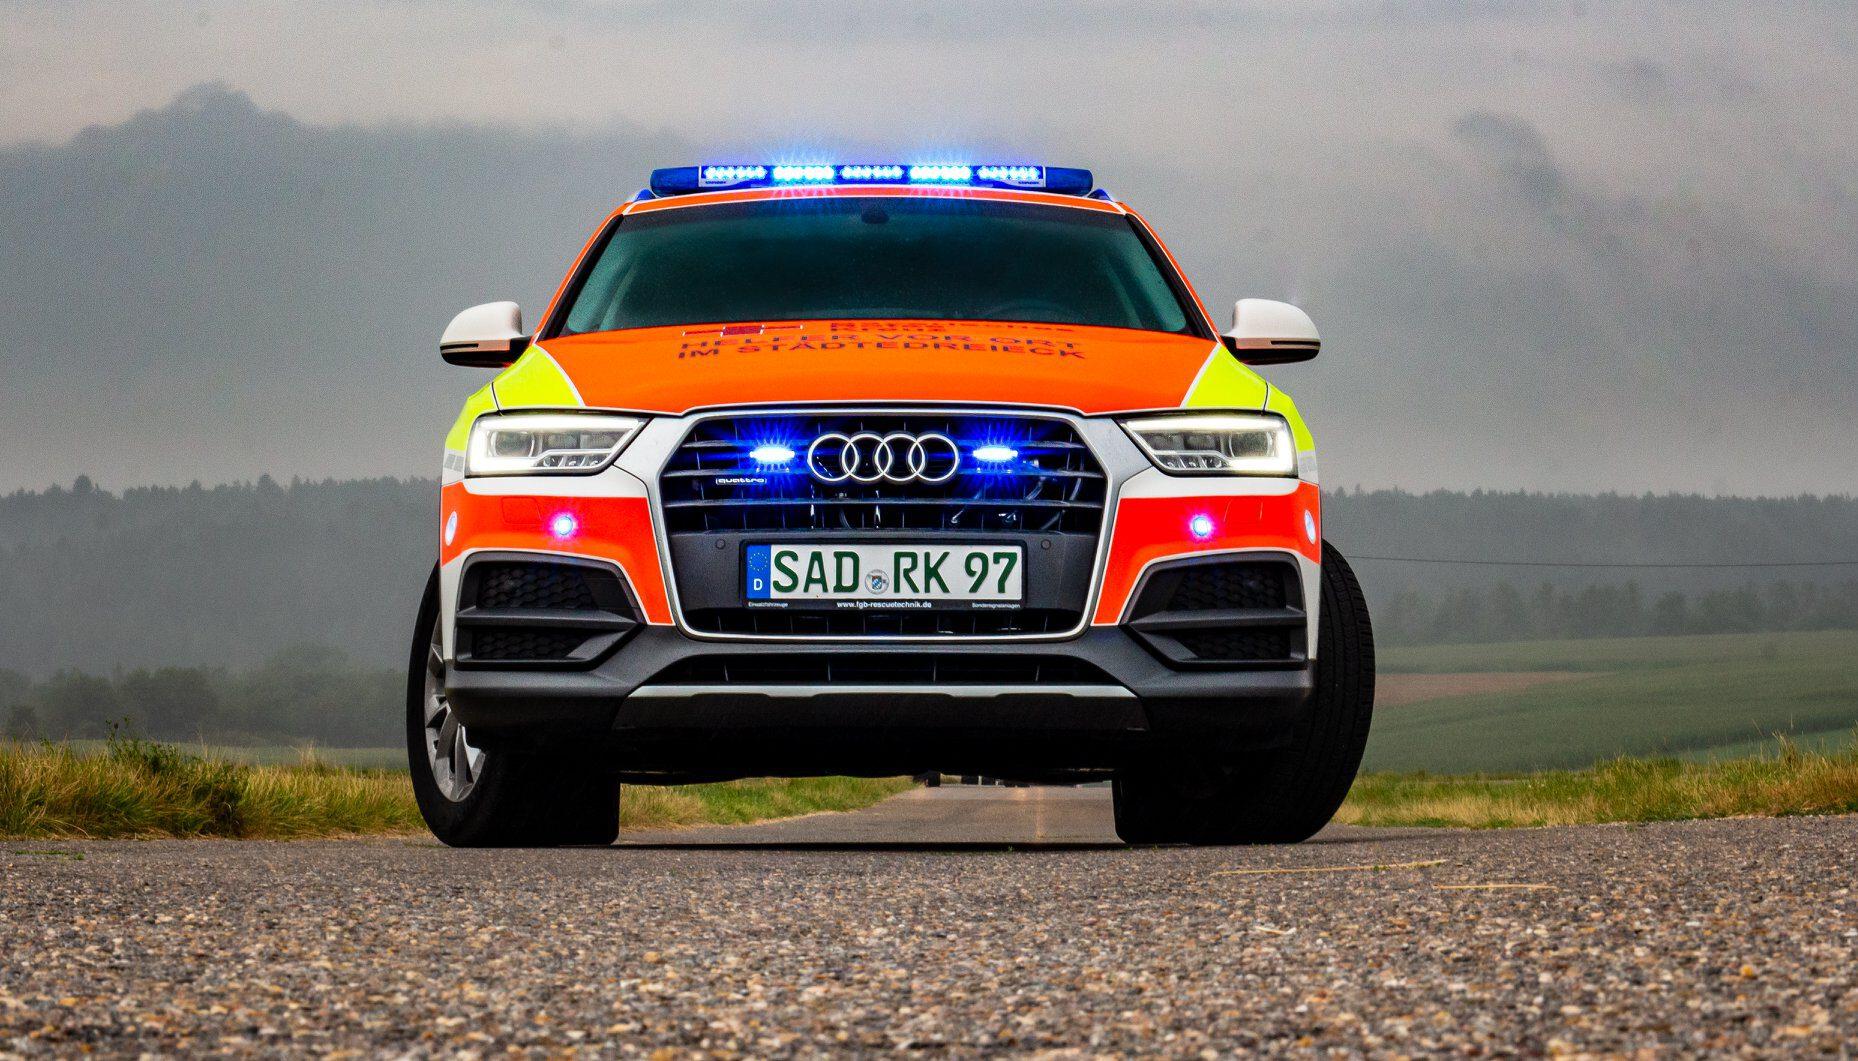 HVO BRK Maxhütte Audi Q3 Front